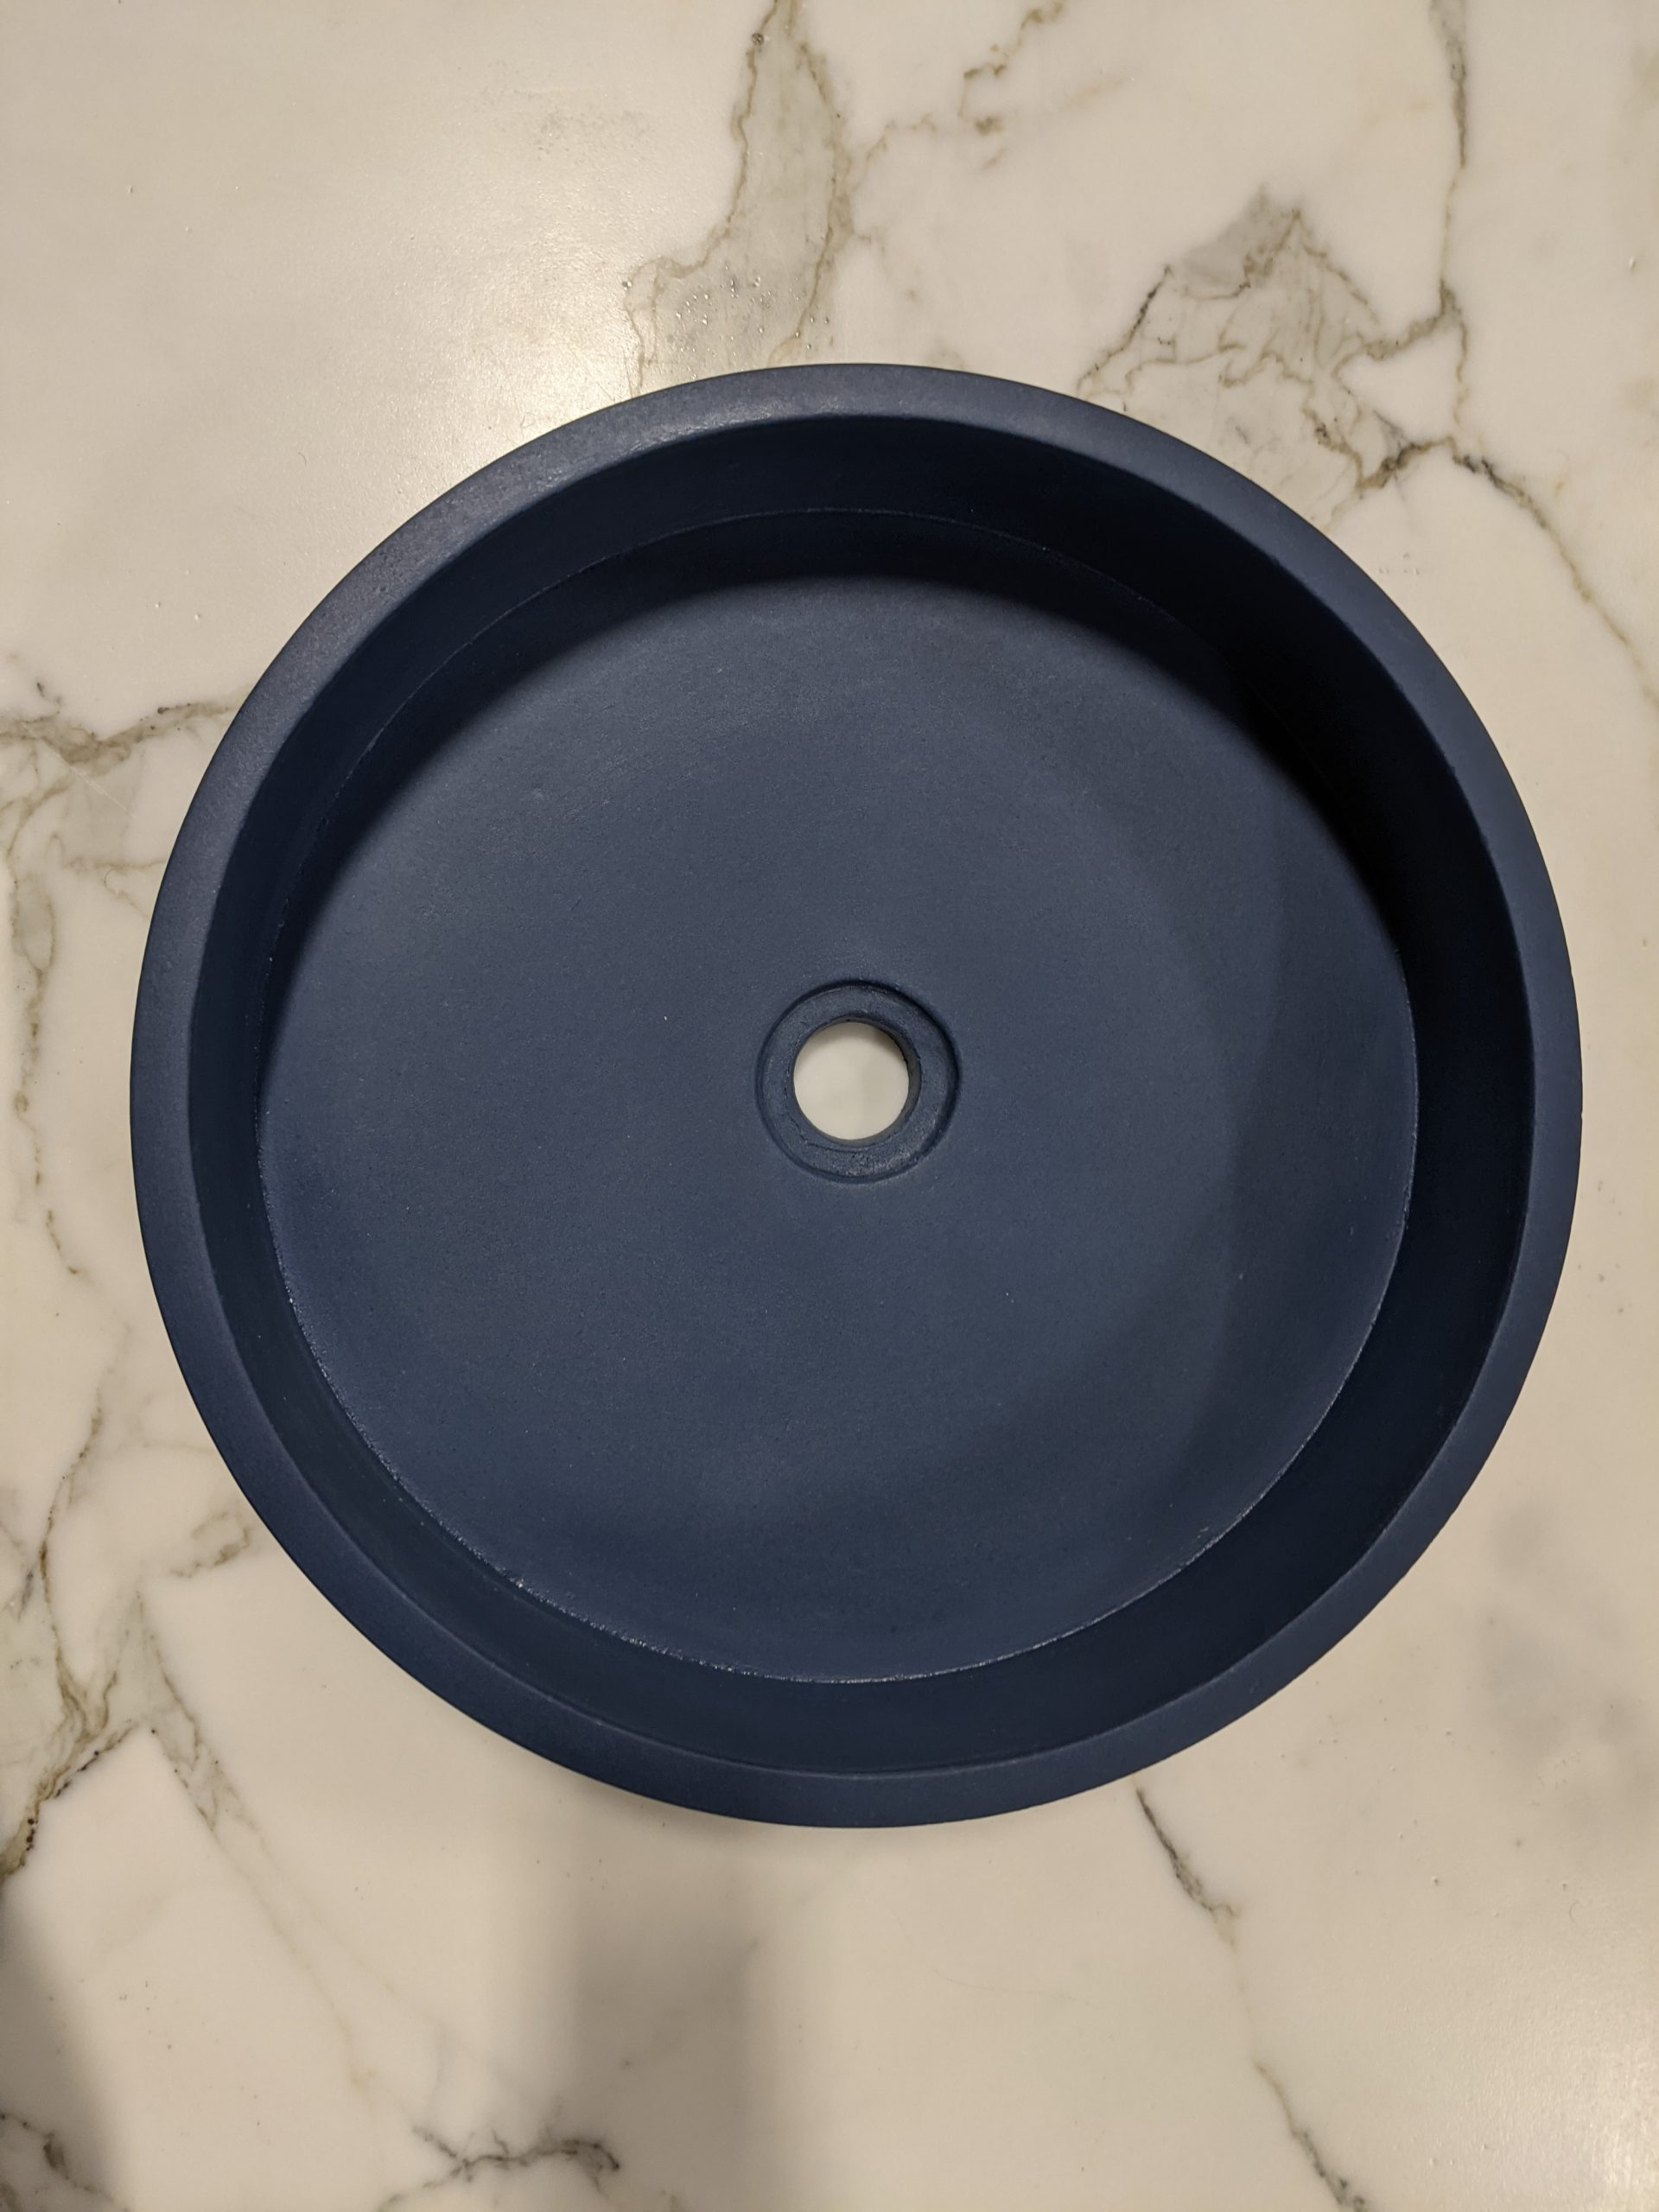 BALUX Volto in Navy Blue